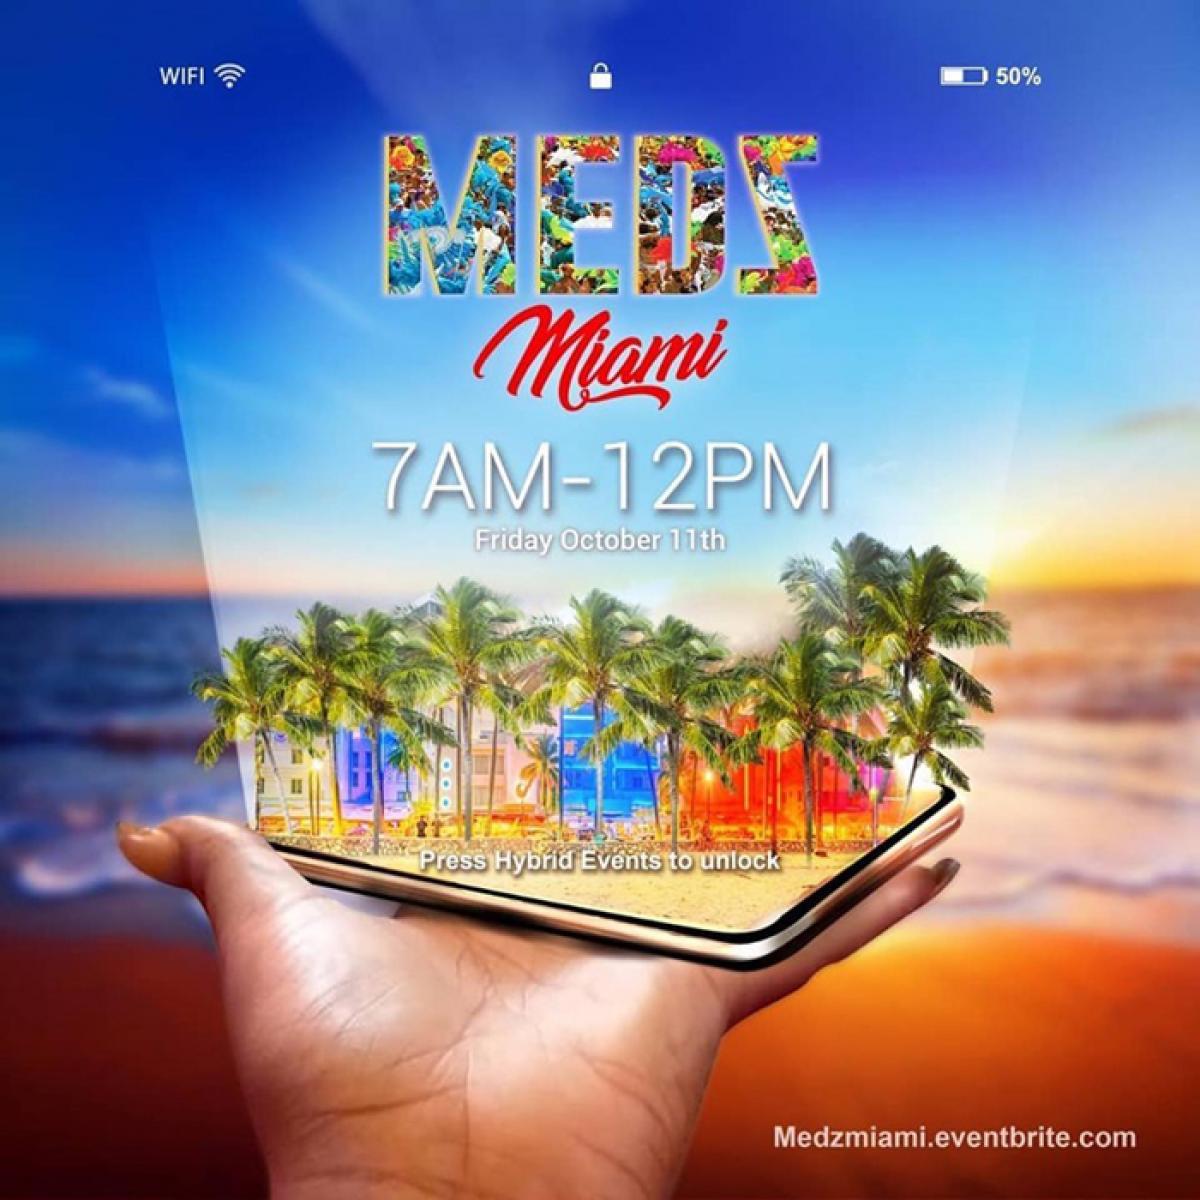 MEDZ flyer or graphic.